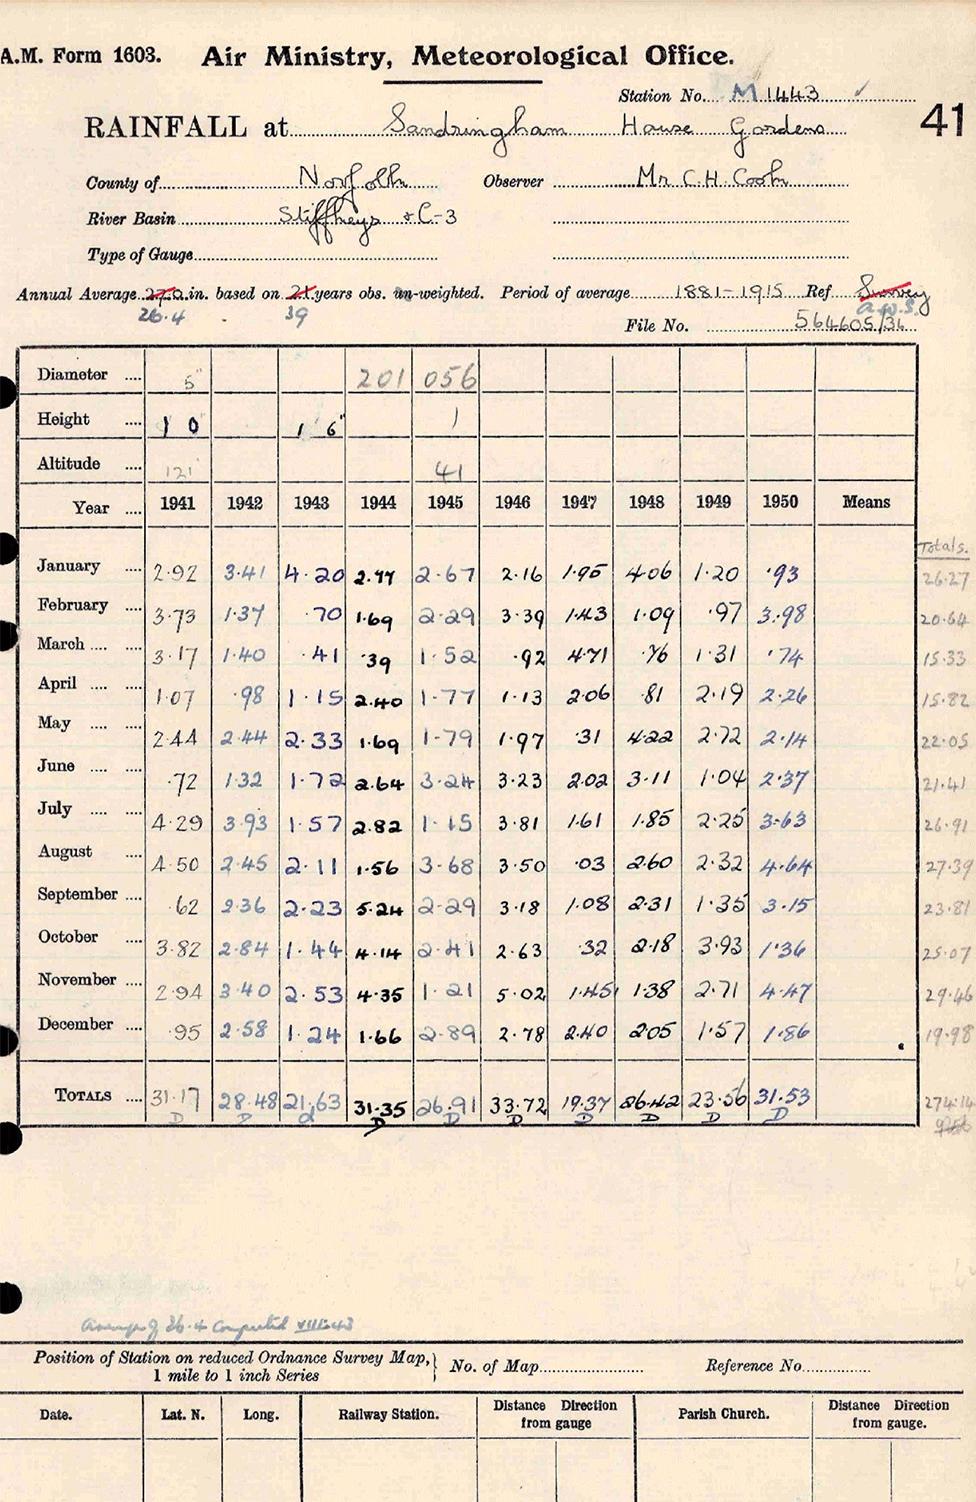 The rain gauge data for Sandringham House during the WWII